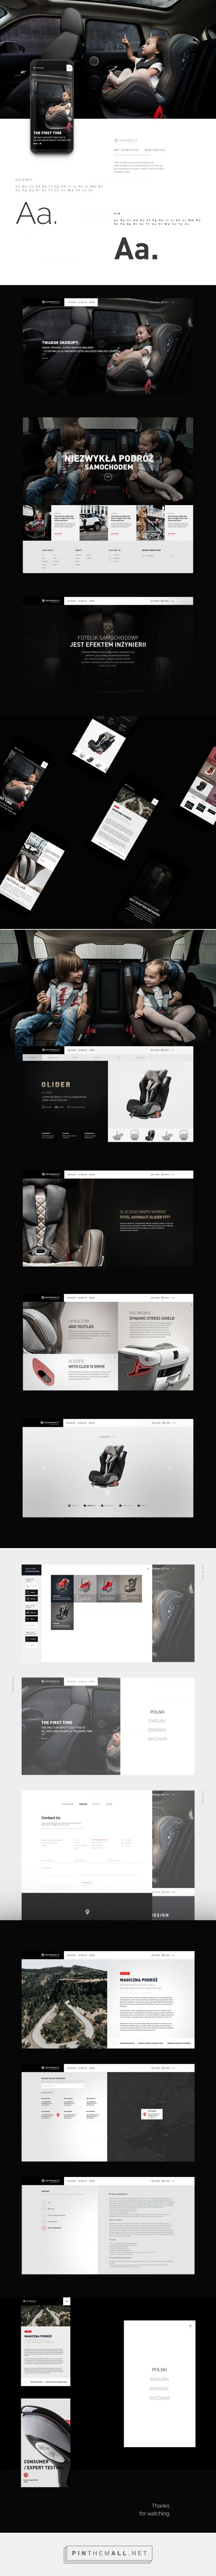 Avionaut - web design on Behance - created via https://pinthemall ...